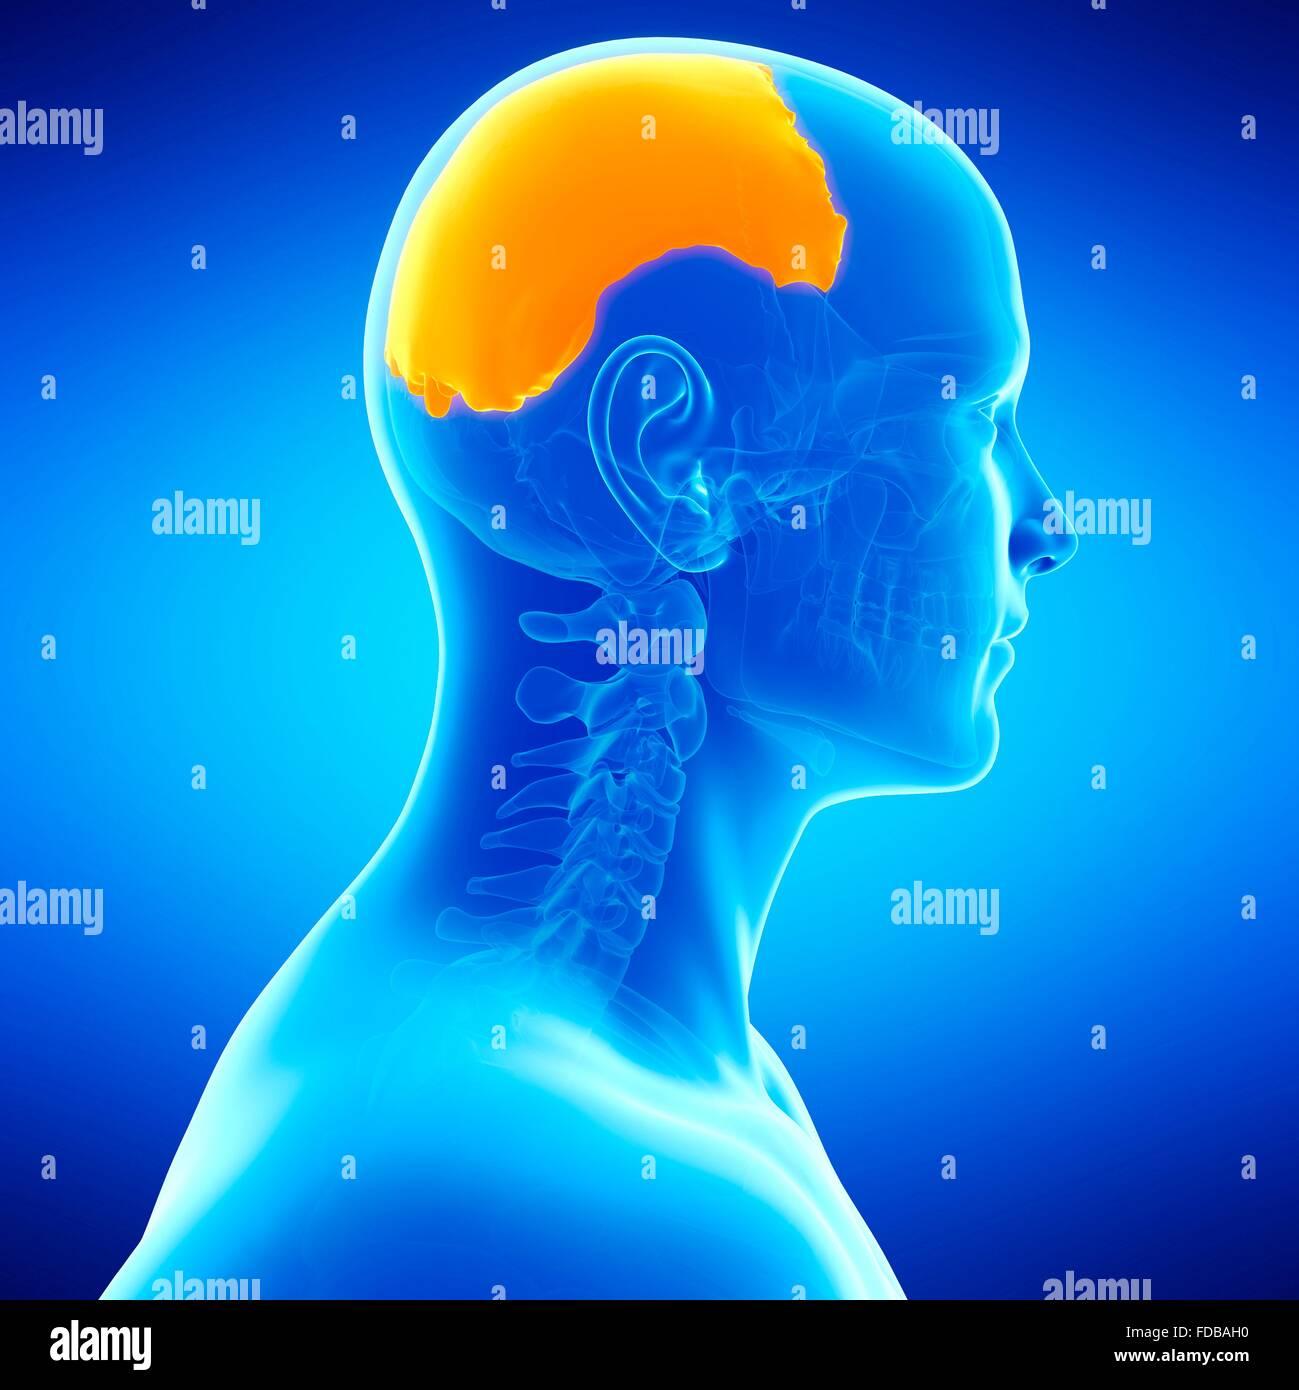 Human Parietal Skull Bone Illustration Stock Photo 94292156 Alamy